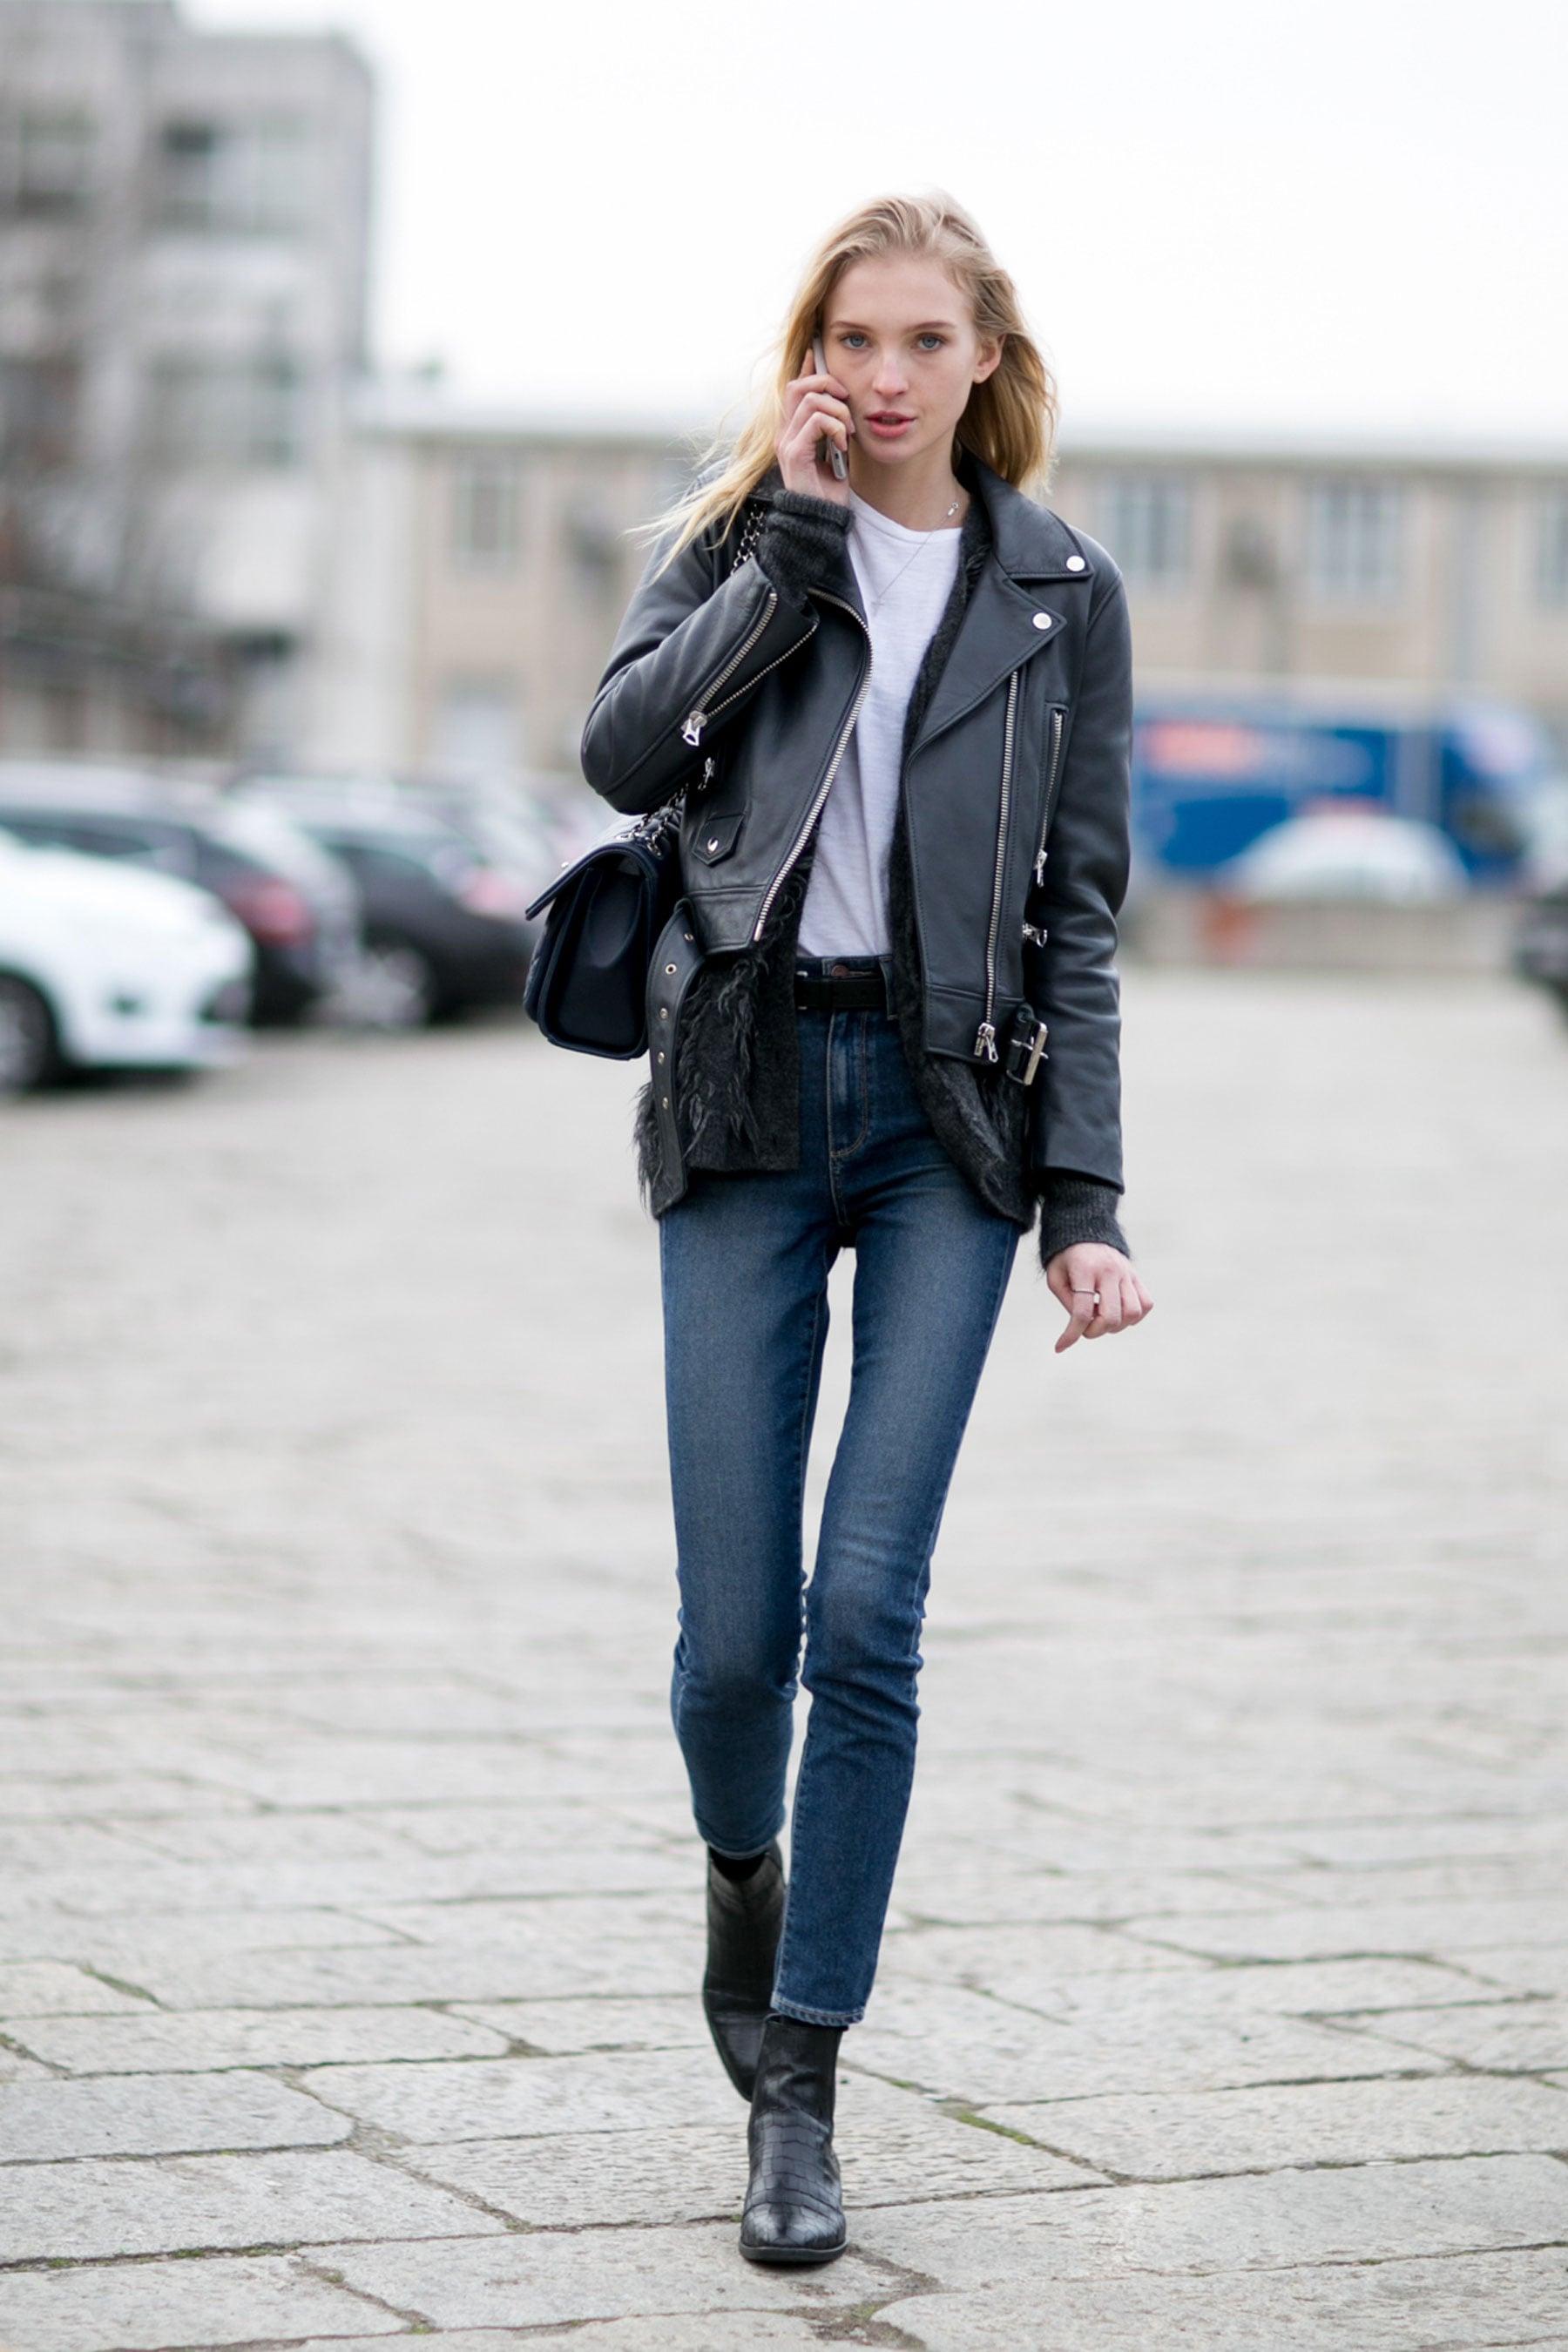 Milan Fashion Week Catch Up On The Best Model Street